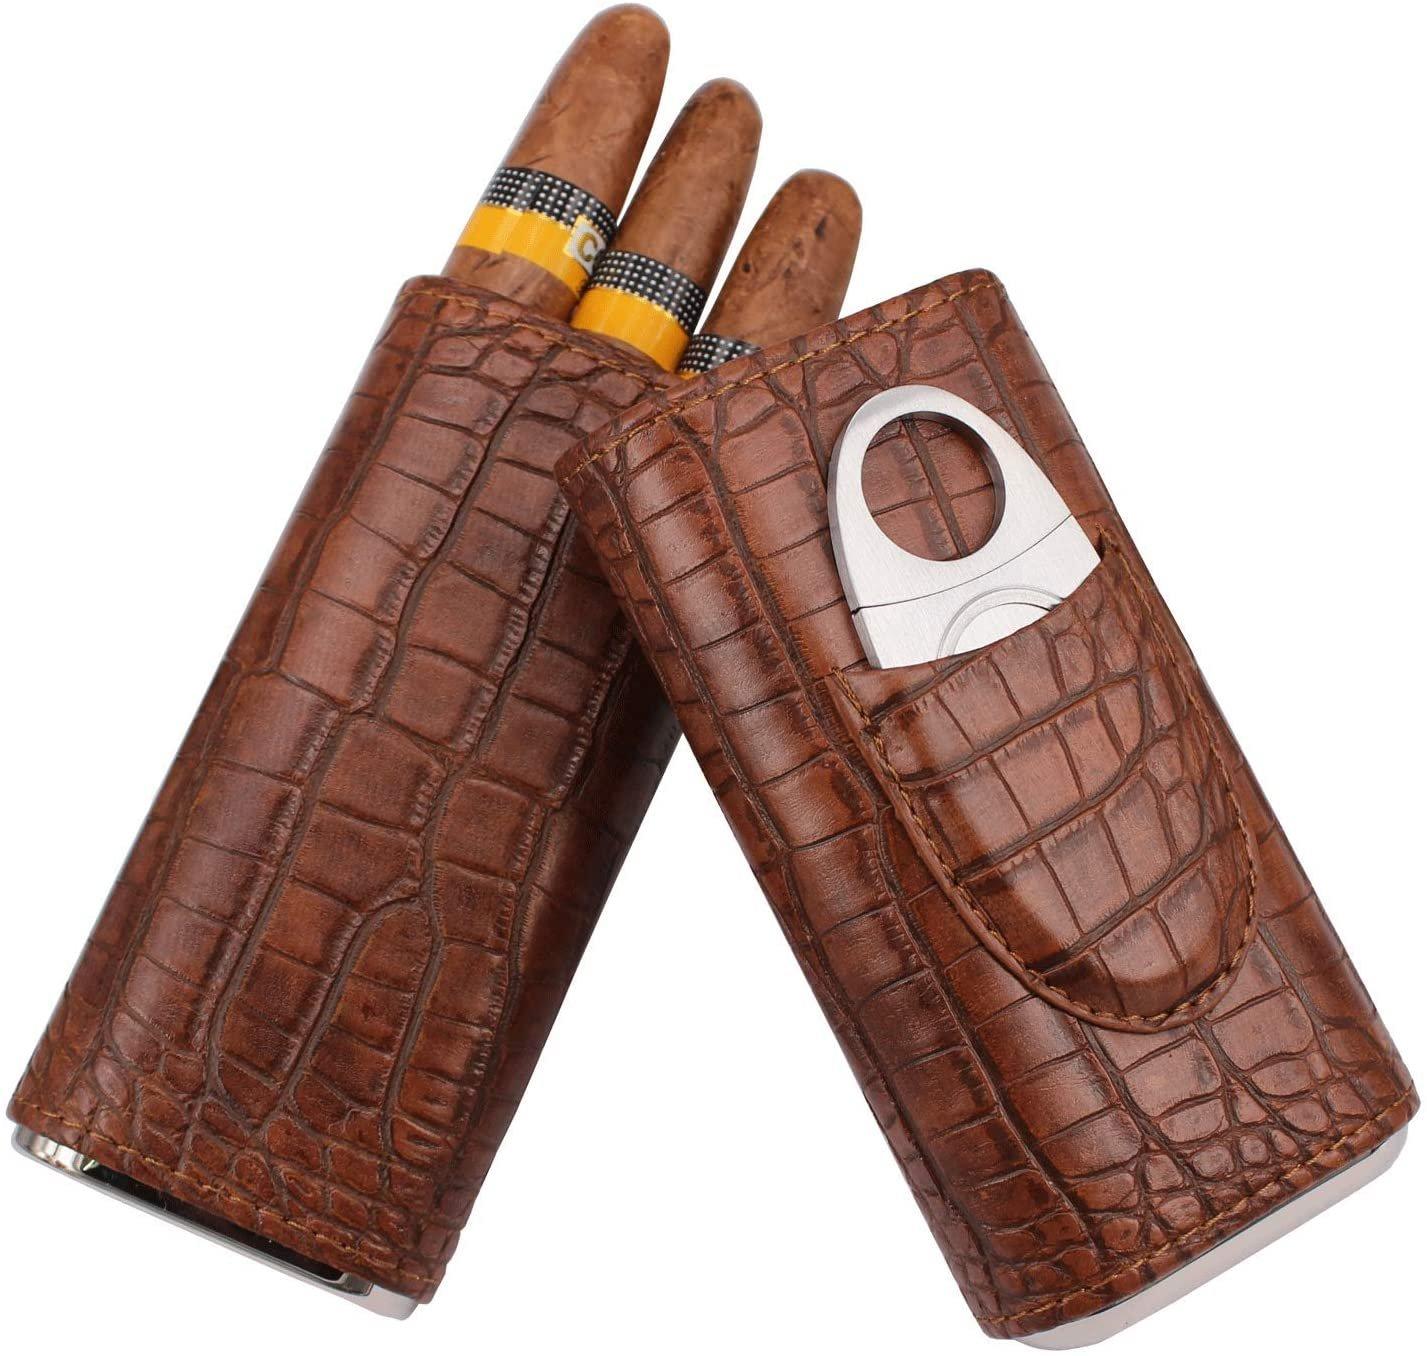 AMANCY 3 Holder Elegant Vintage Style Crocodile Leather Cigar Case w/ Cedar Wood Lined